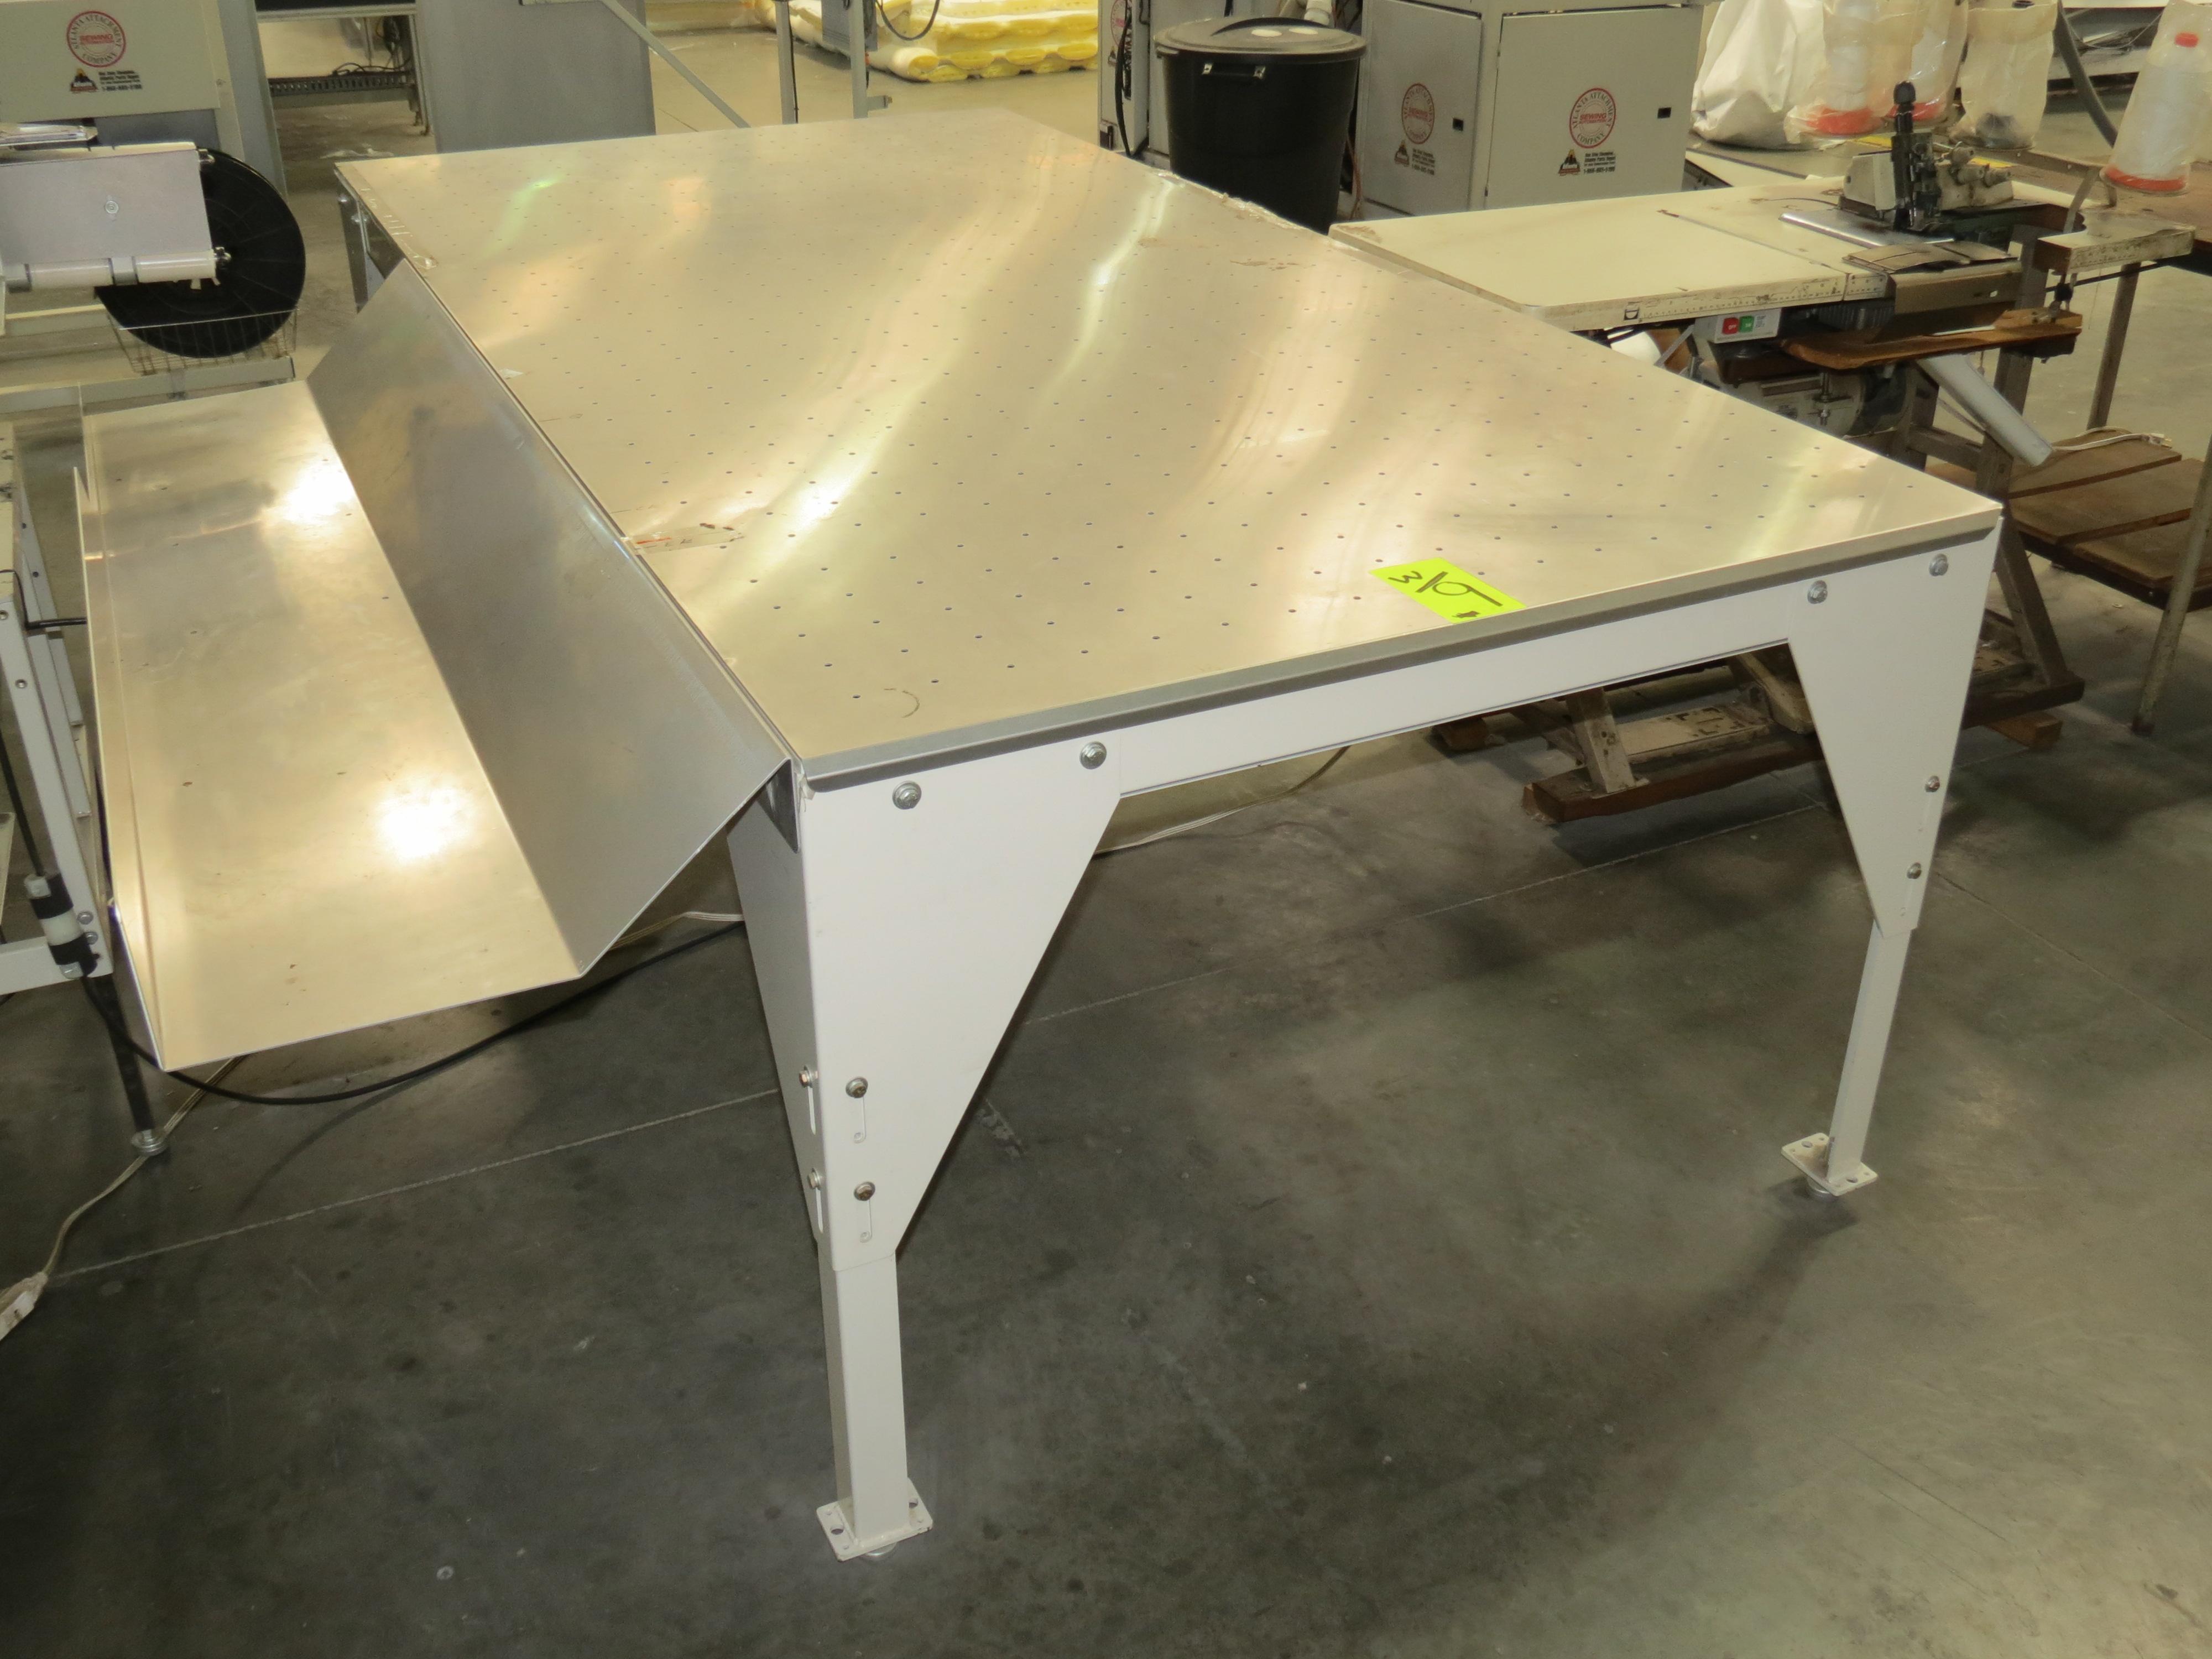 "Porter International PFM-1000 Flange Sewing Machine, with Floatation Table 95"" X 47"" 220V, SN:9434 - Image 3 of 3"